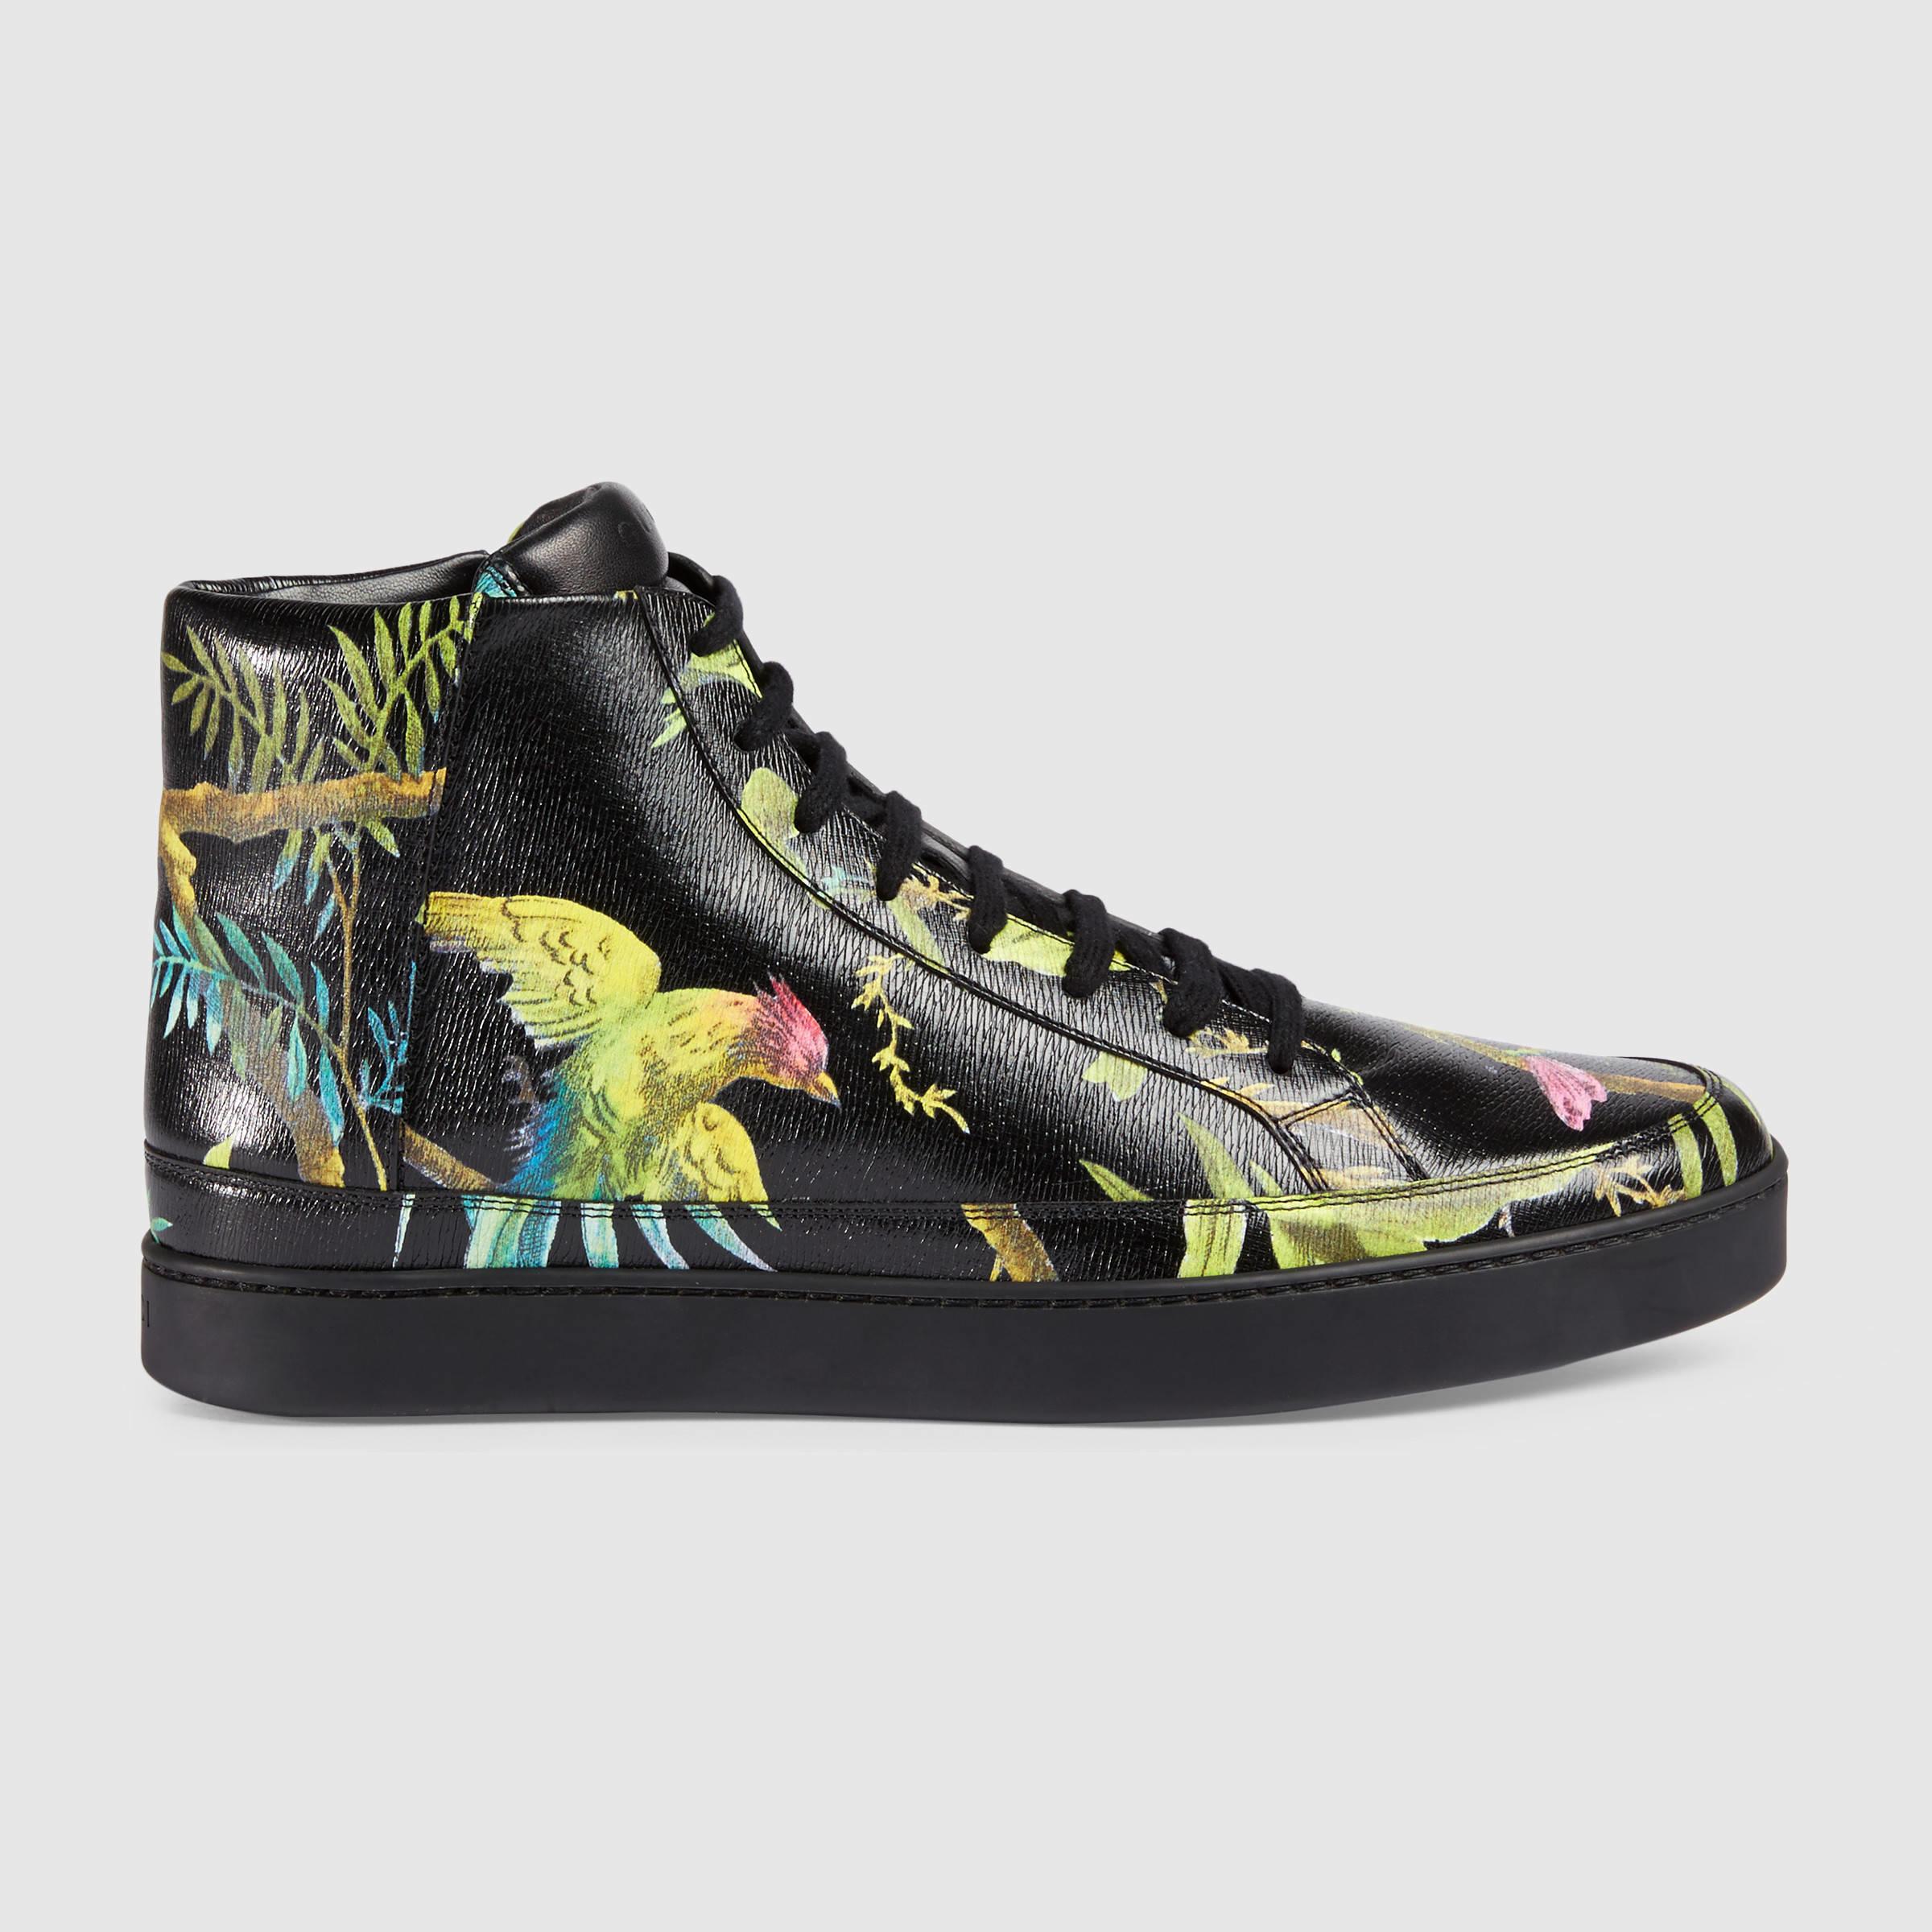 f6297f5a0621 Lyst - Gucci Tropical Print High-top Sneaker in Black